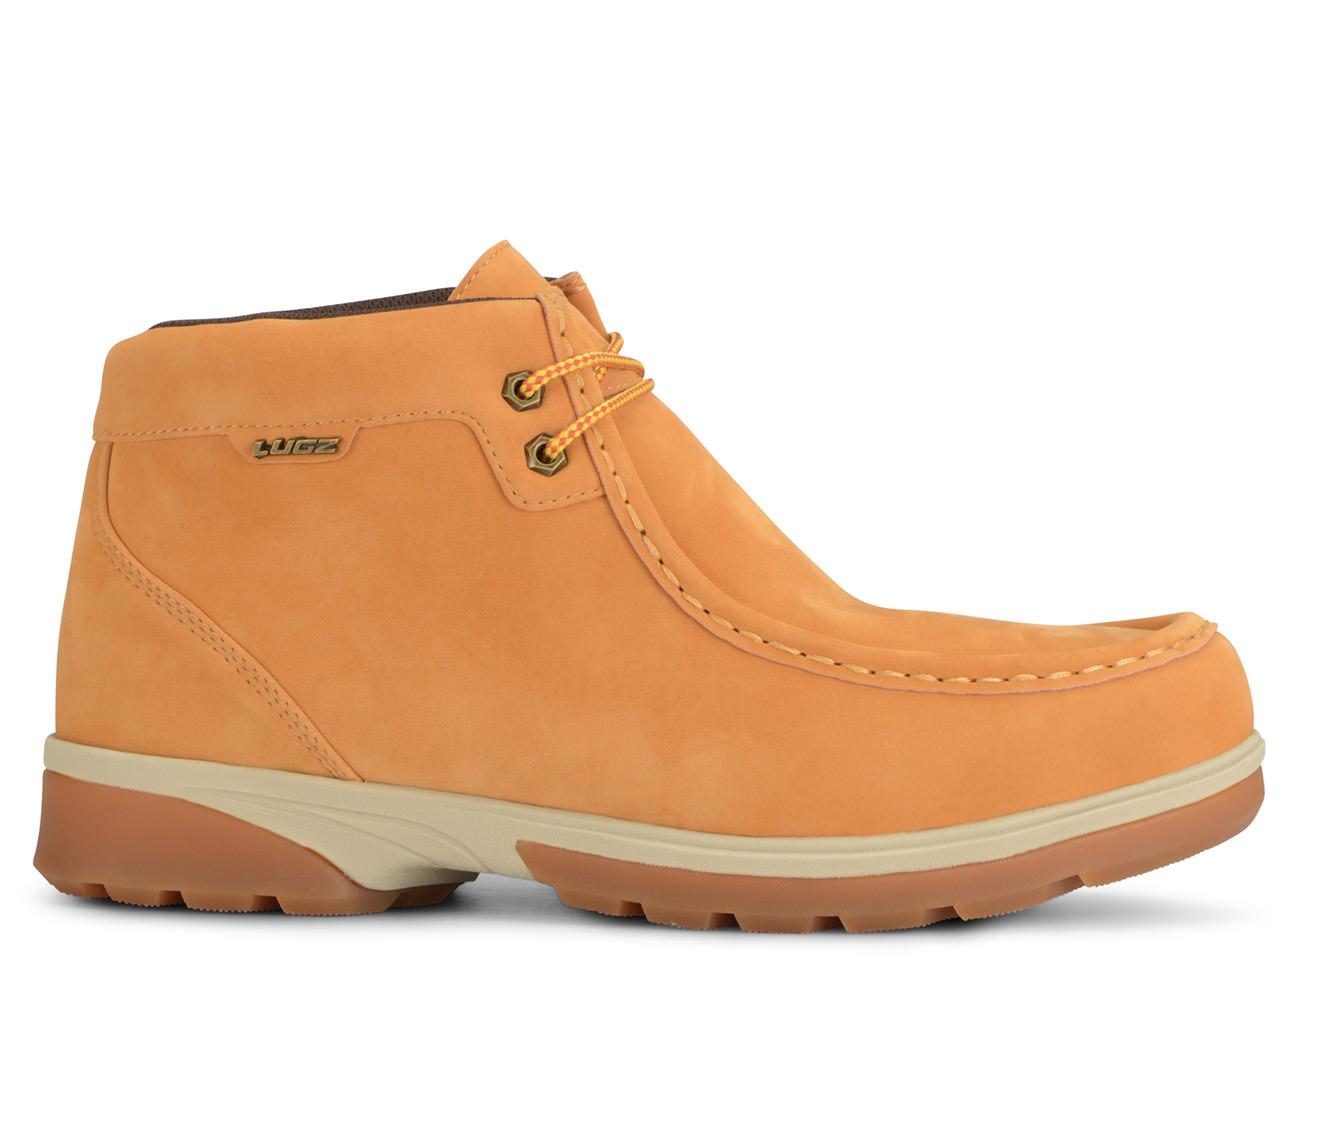 Lugz Zeo Moc Mid-Rise Men's Boots (Brown Faux Leather)